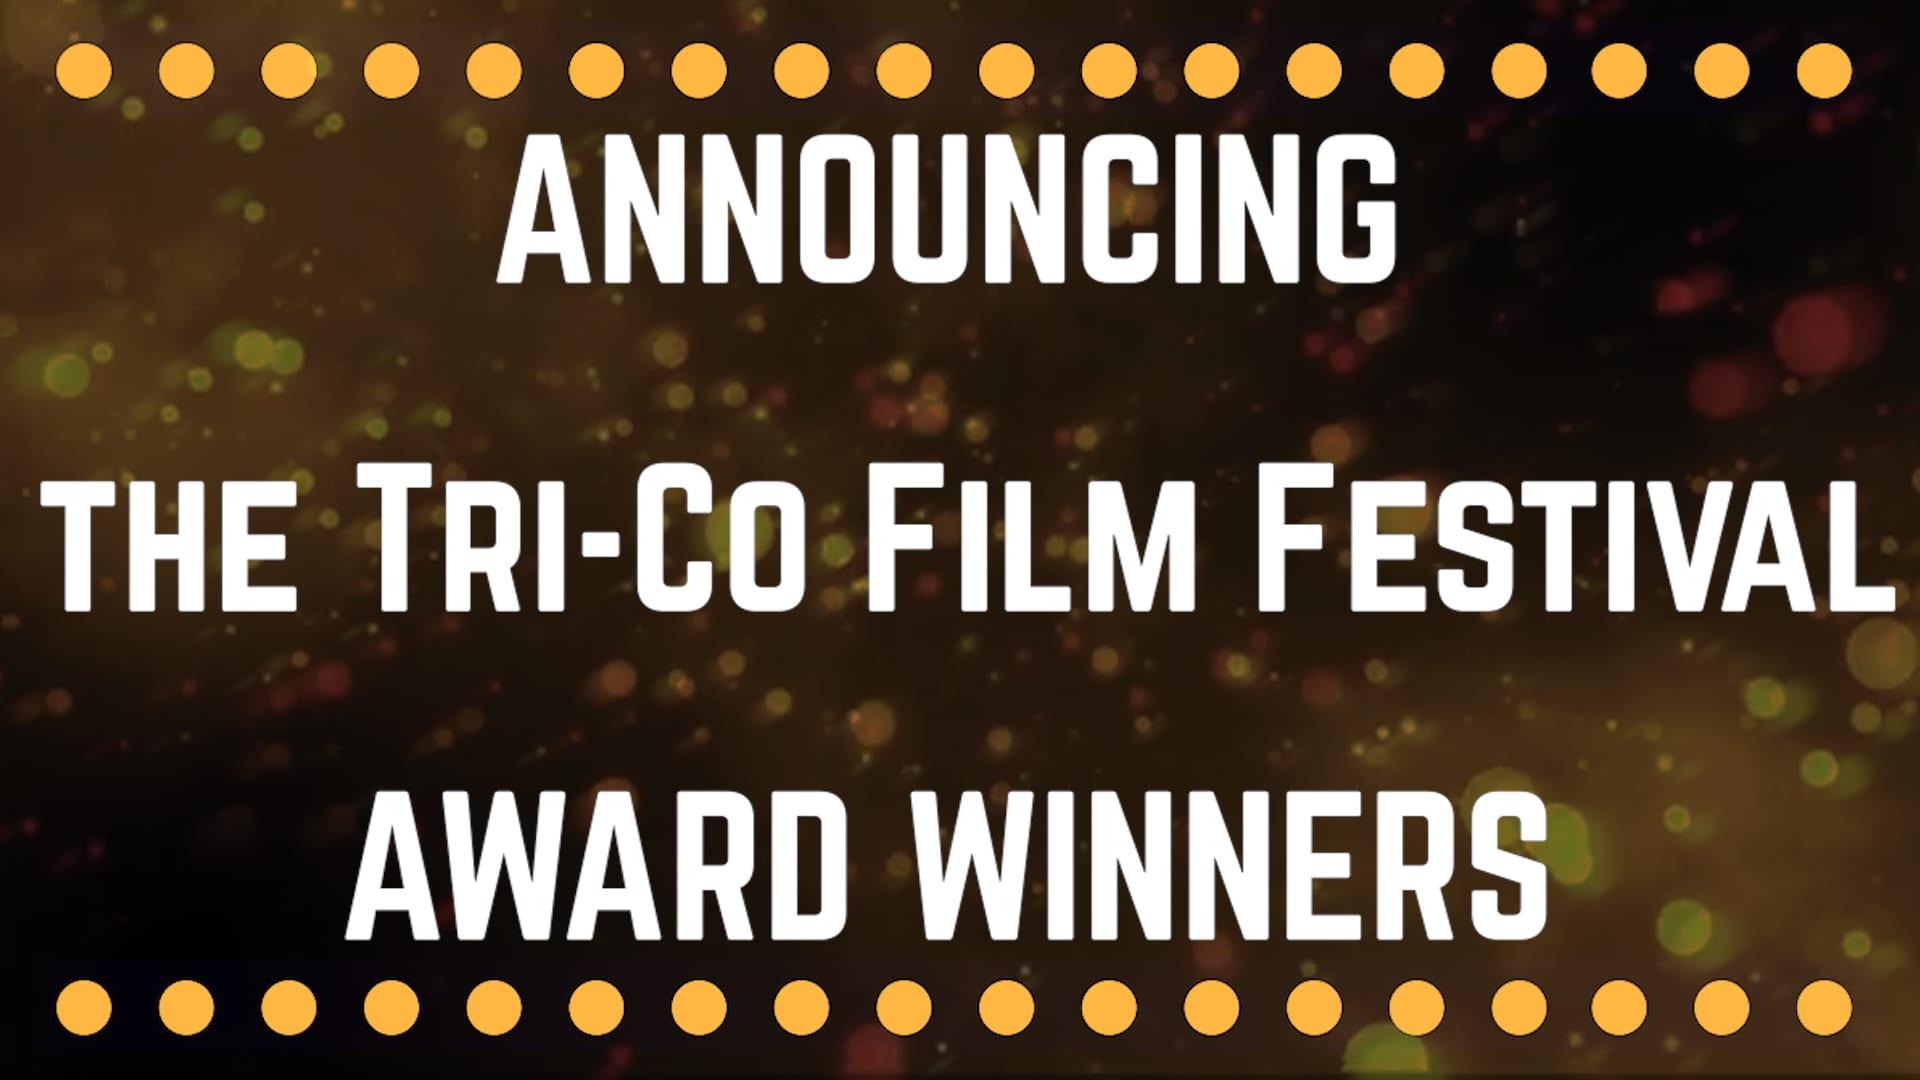 Announcing Award Winners